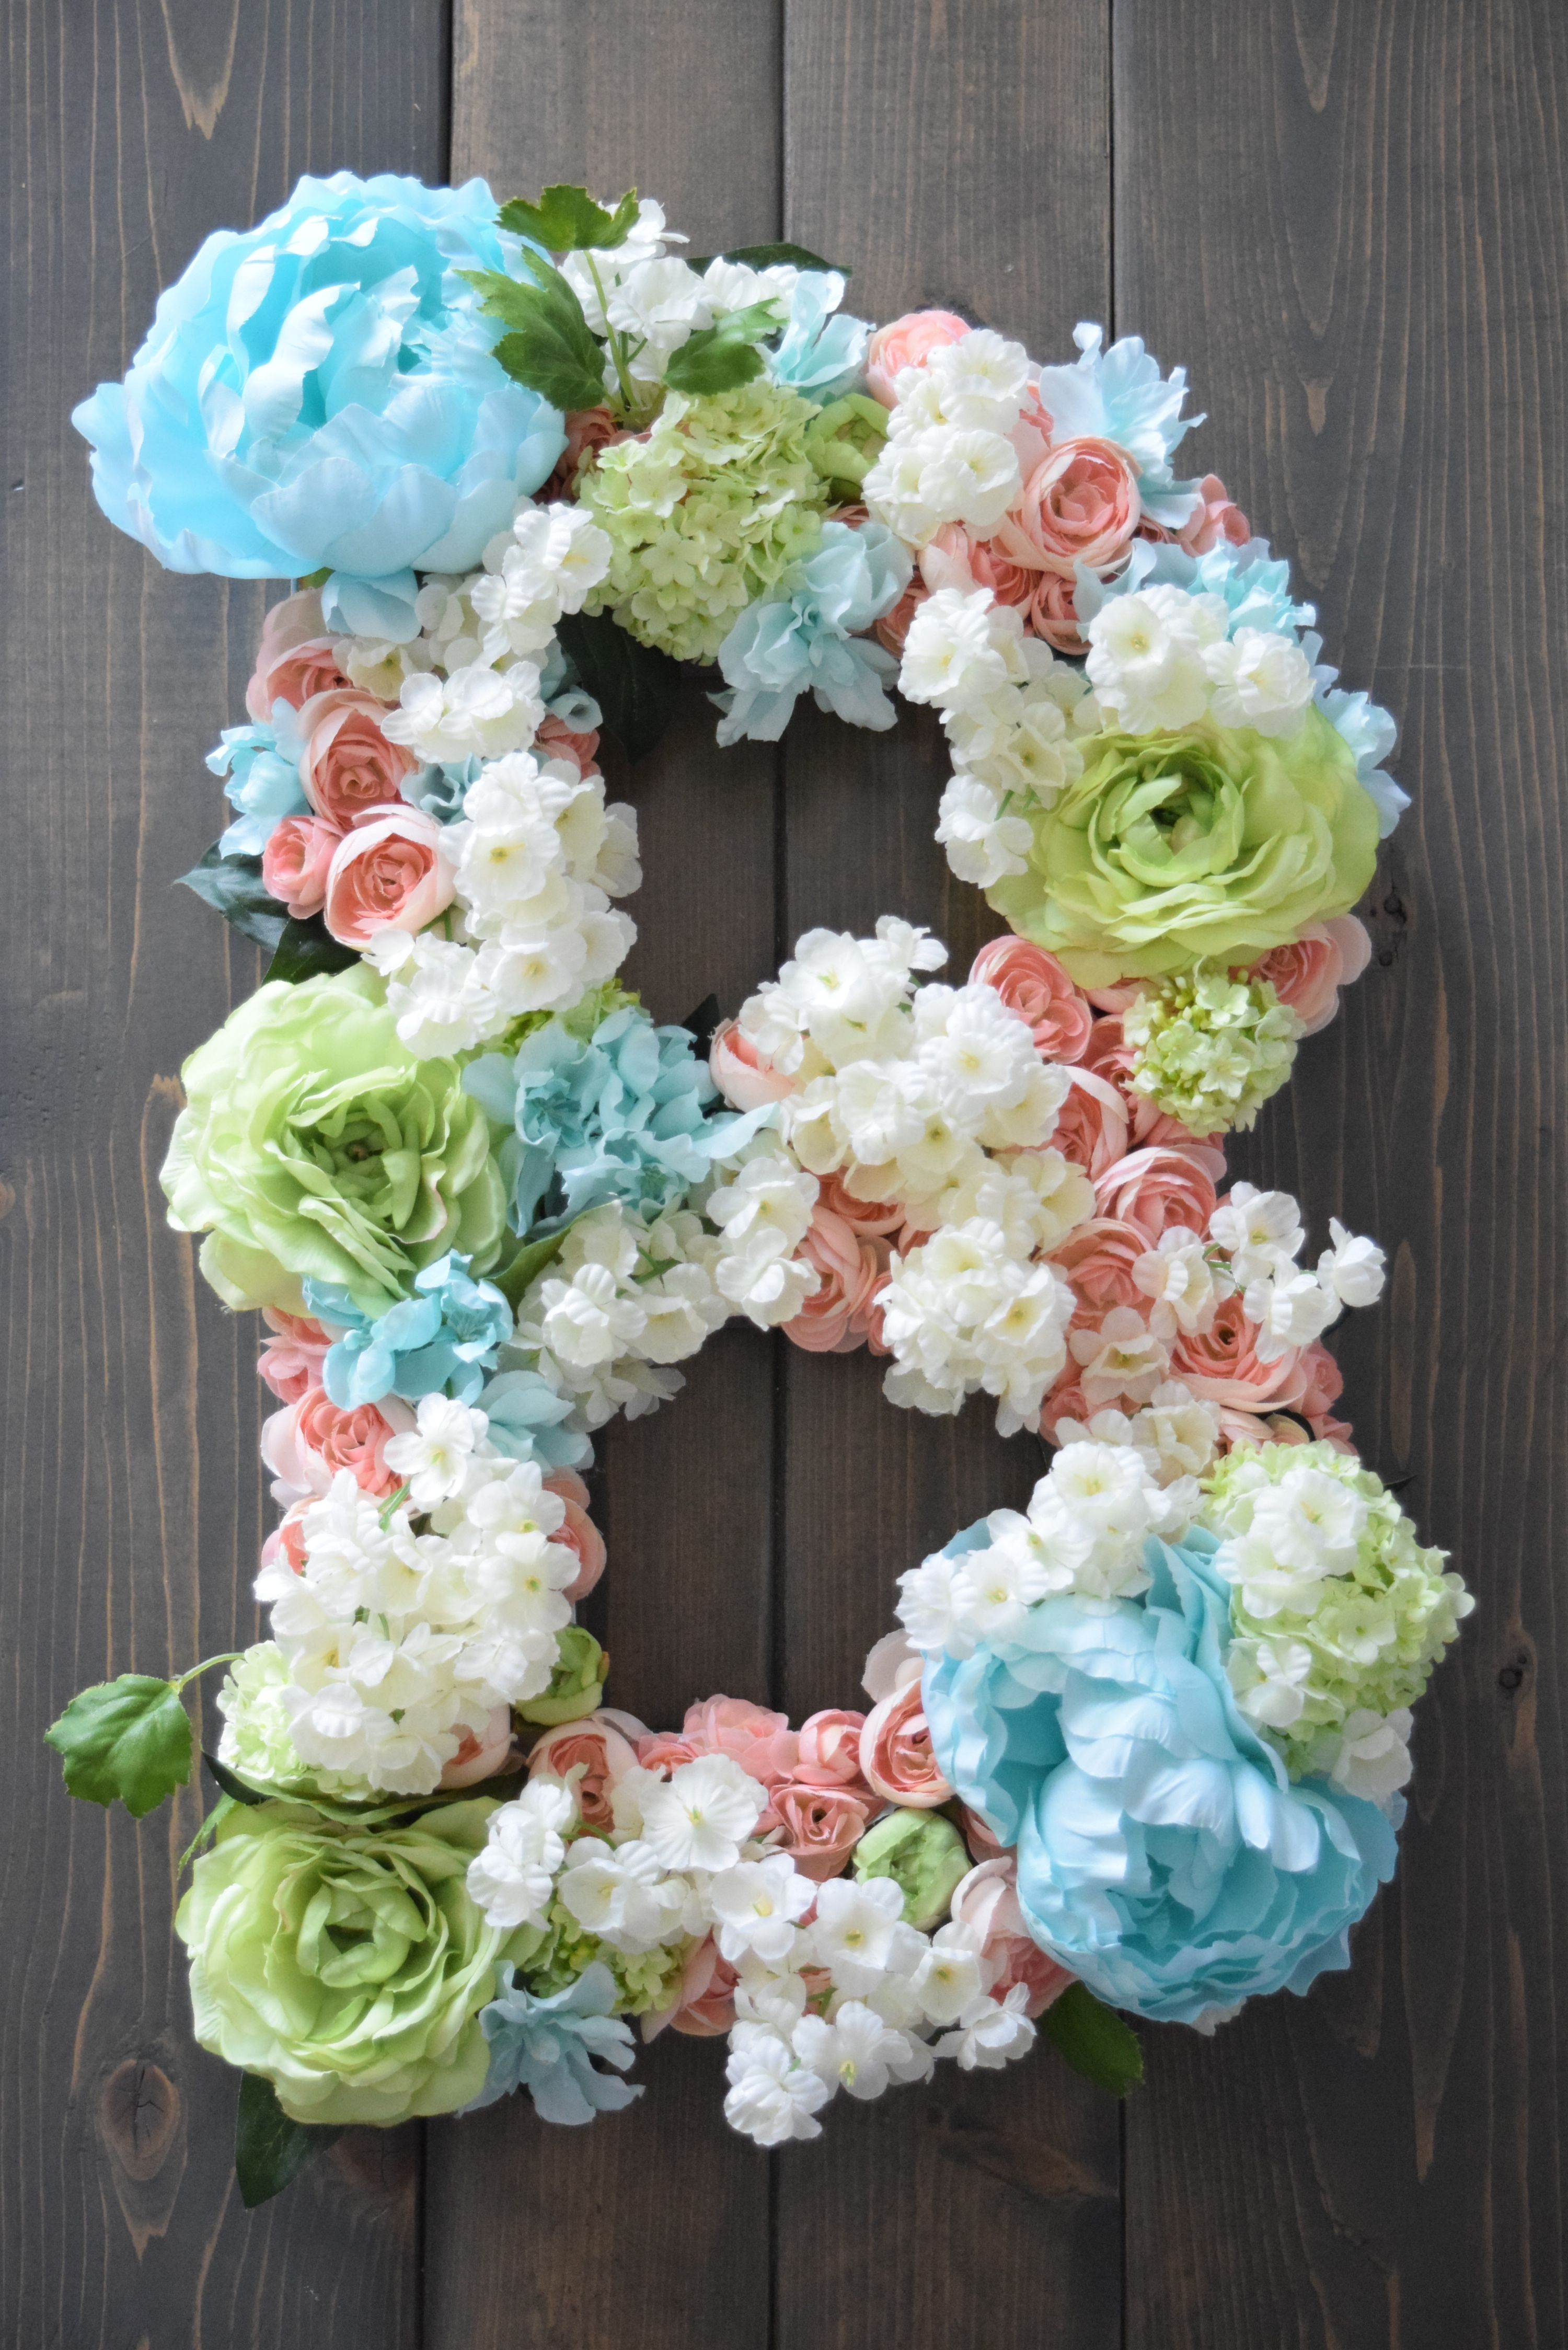 Bailey Begonia On Etsy Large Flower Letter Large Flower Letter